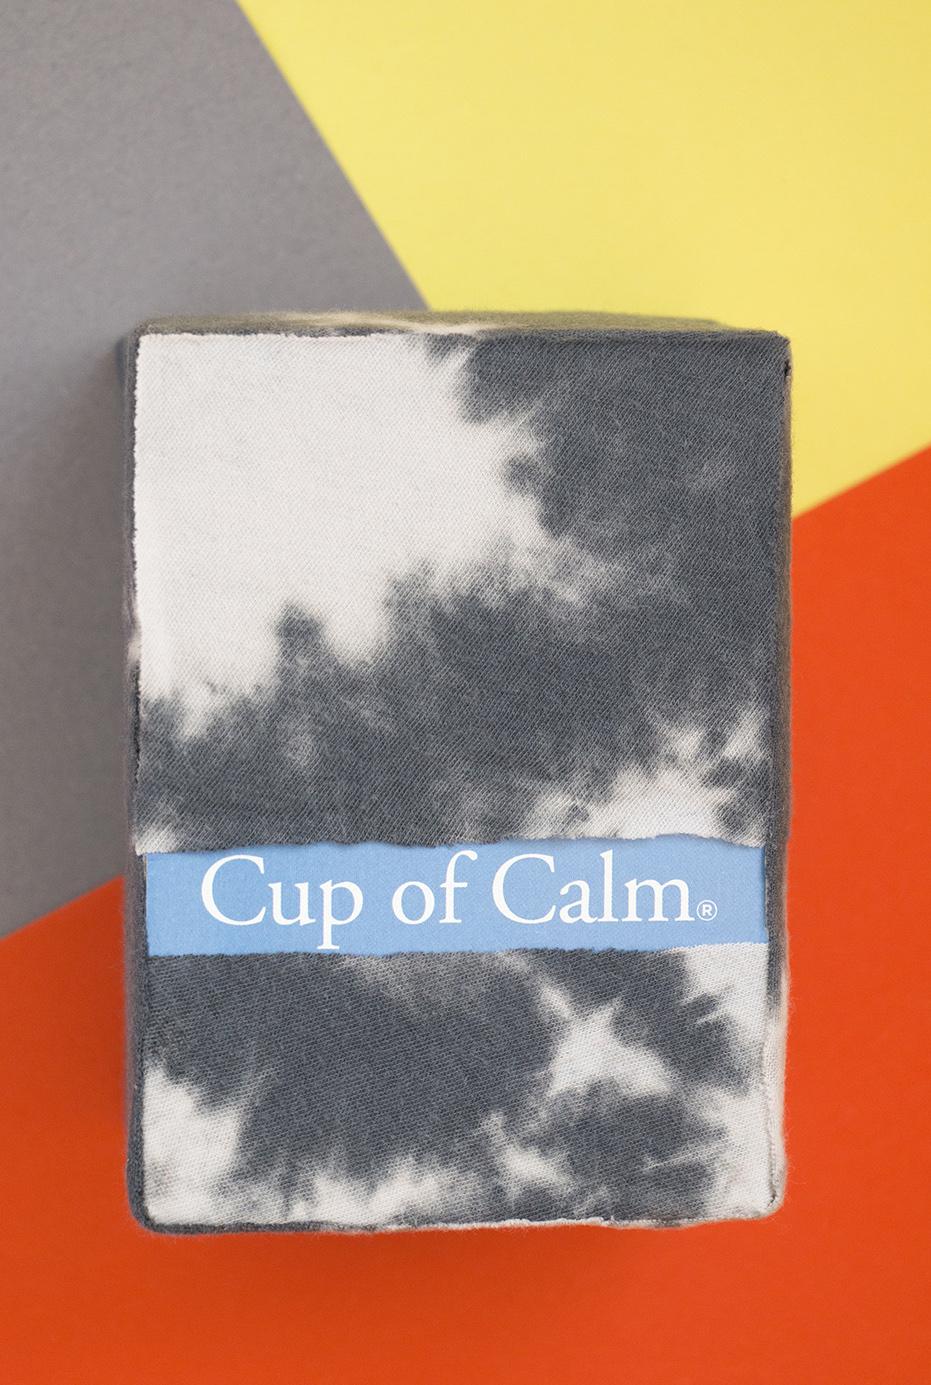 cupofcalm.jpg